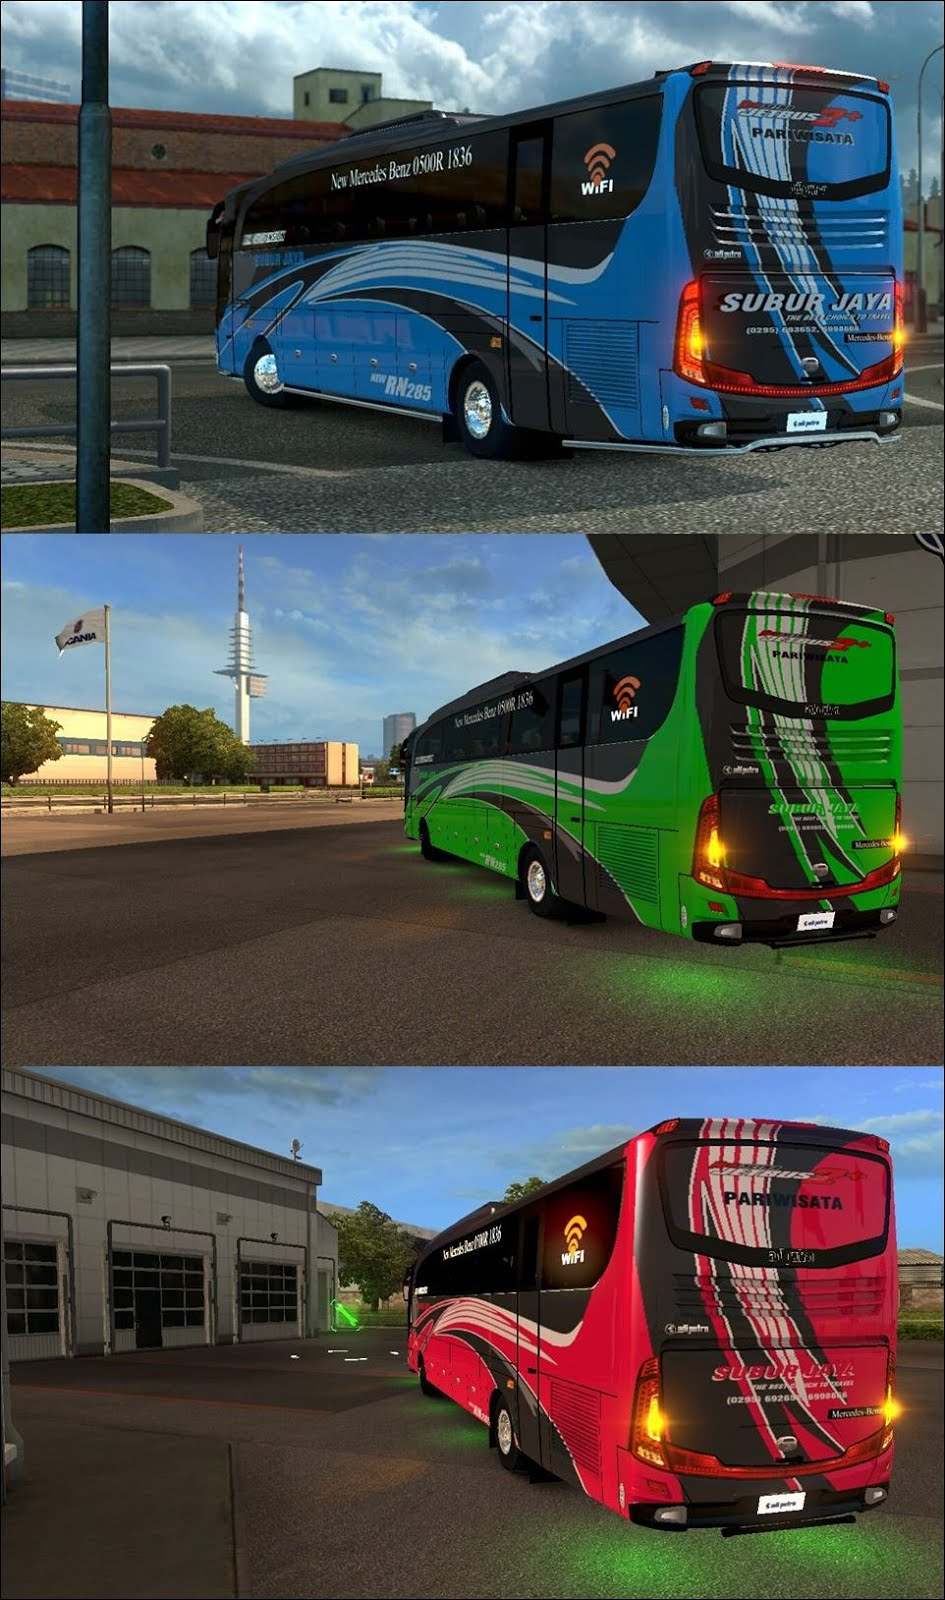 Kumpulan Skin Livery Bus Ets2 Part 5 Mod Indonesia Euro Truck Simulator 2 V130 Dan New Subur Jaya By Ramzy Rahmansyah For Jb2hd